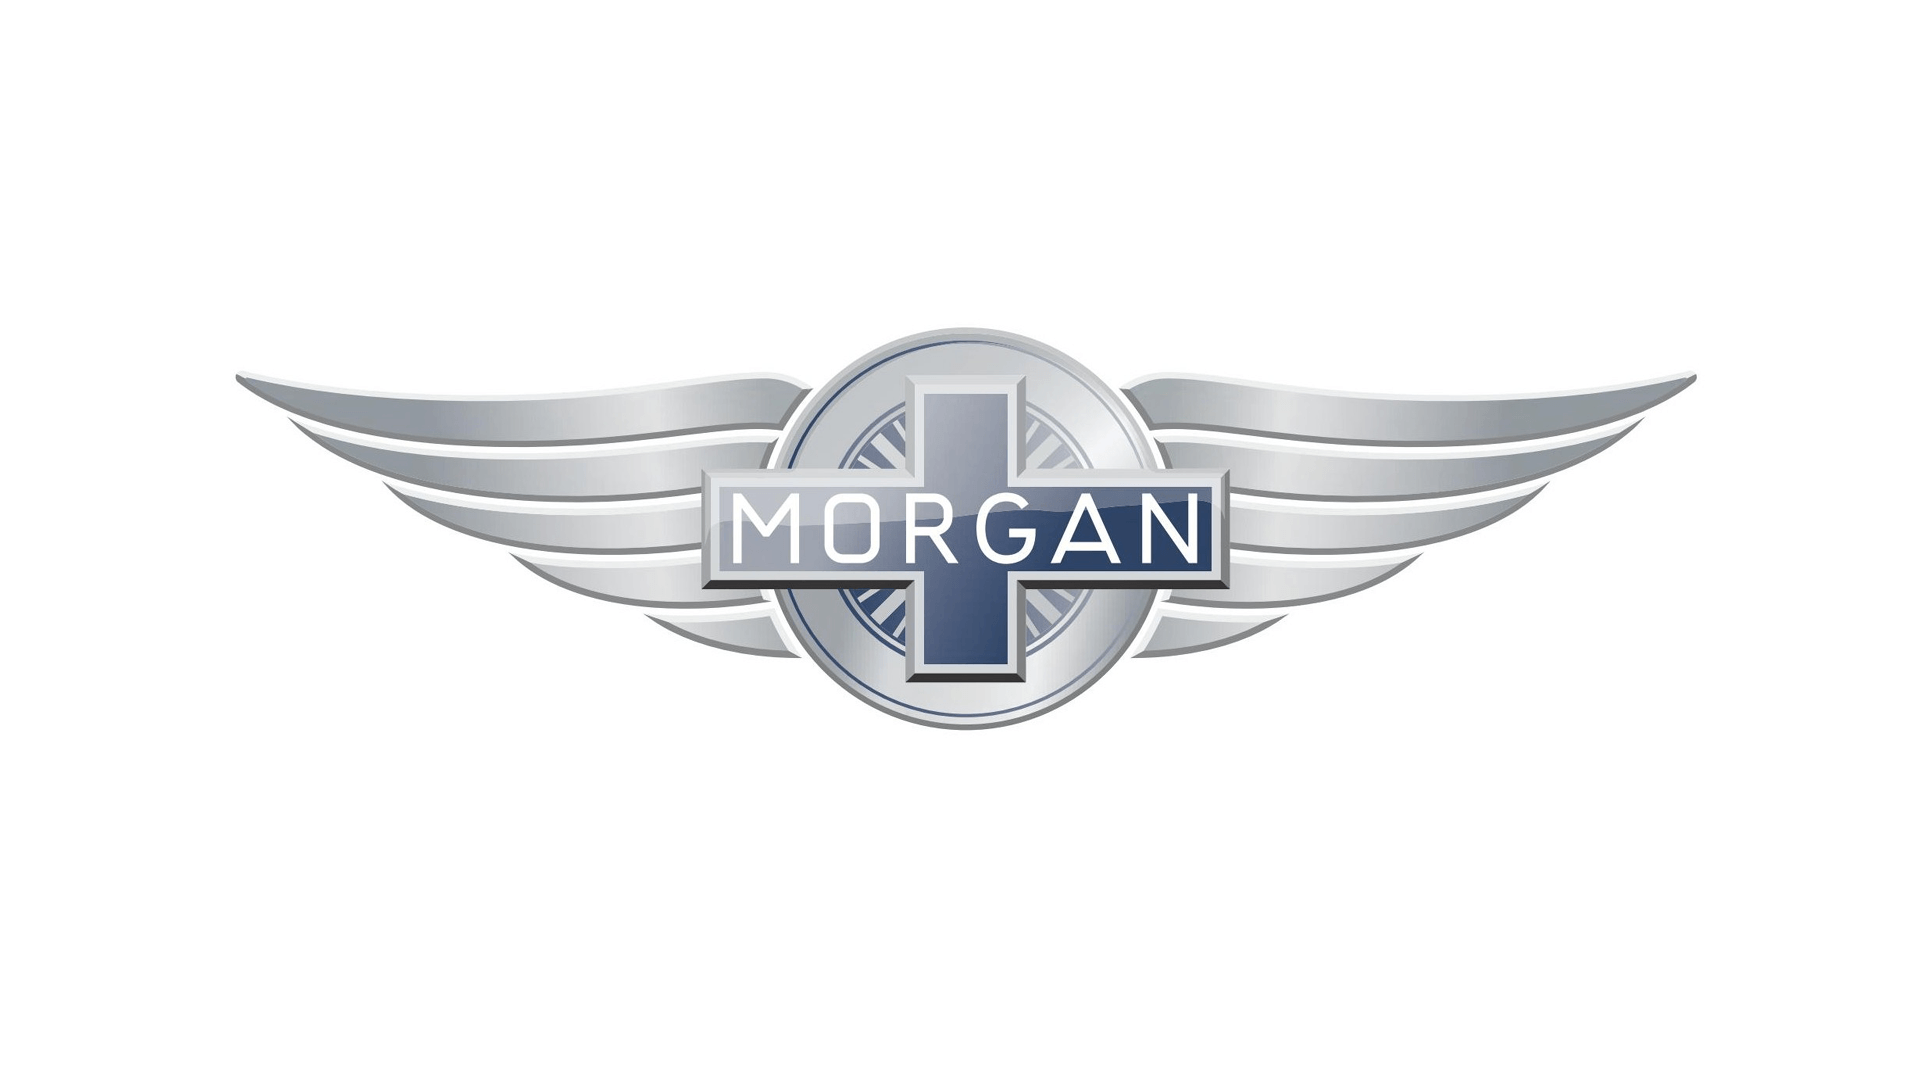 Wings And Shield Car Logo Logodix